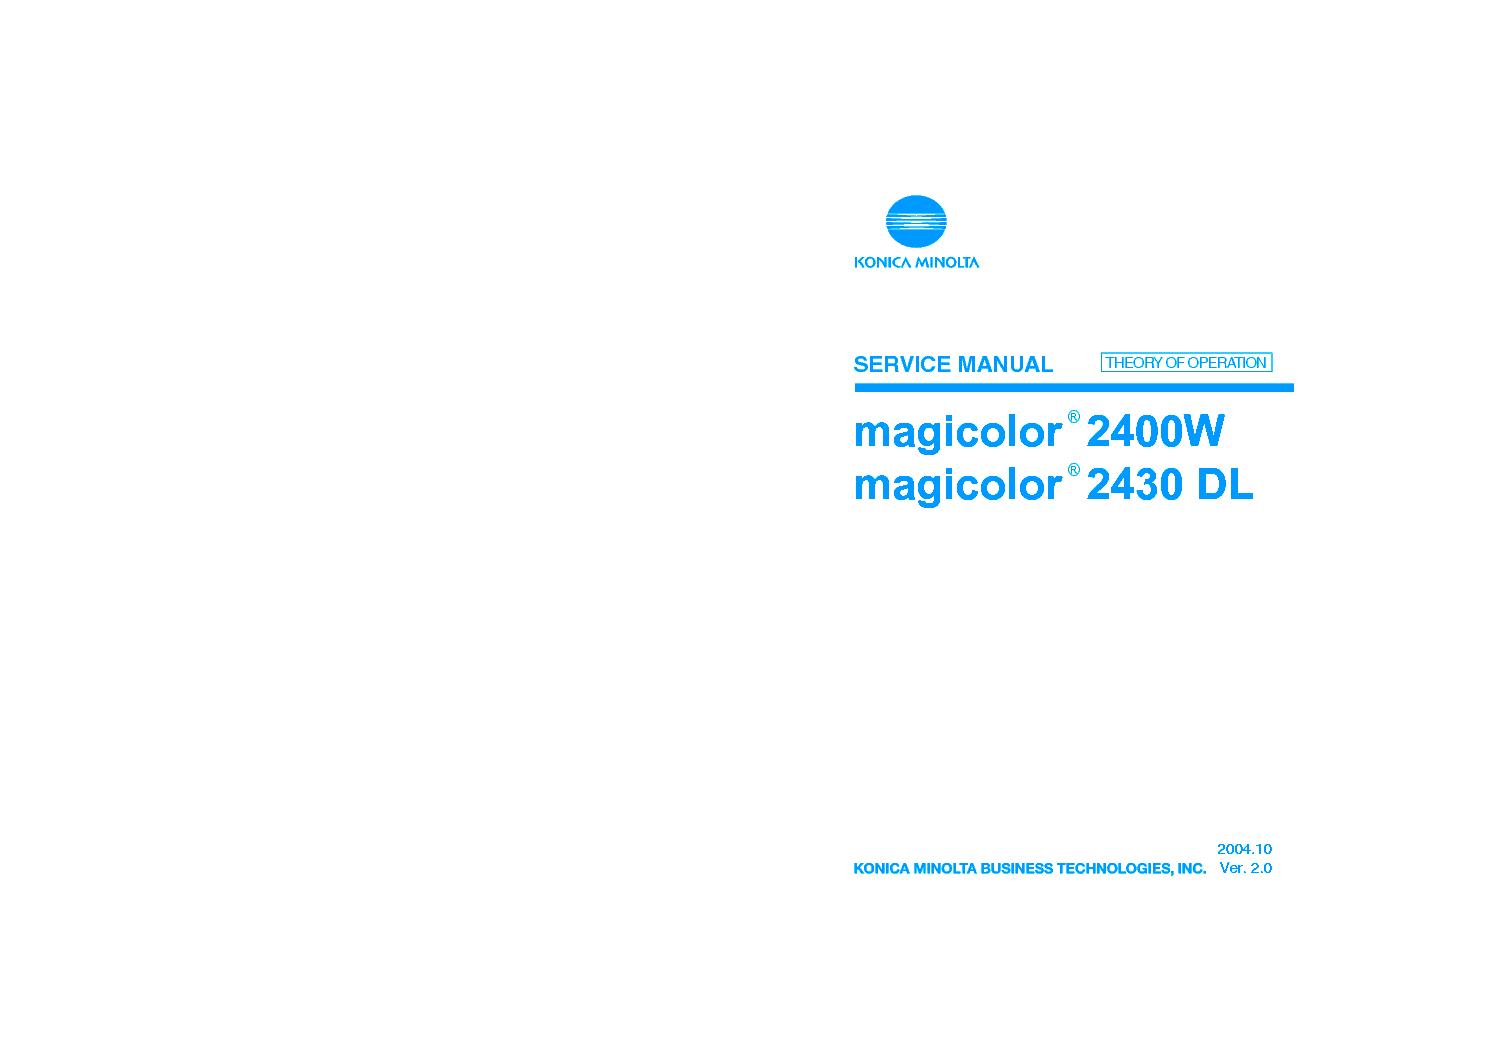 KONICA MINOLTA 2400W 2430 DL SM service manual (1st page)